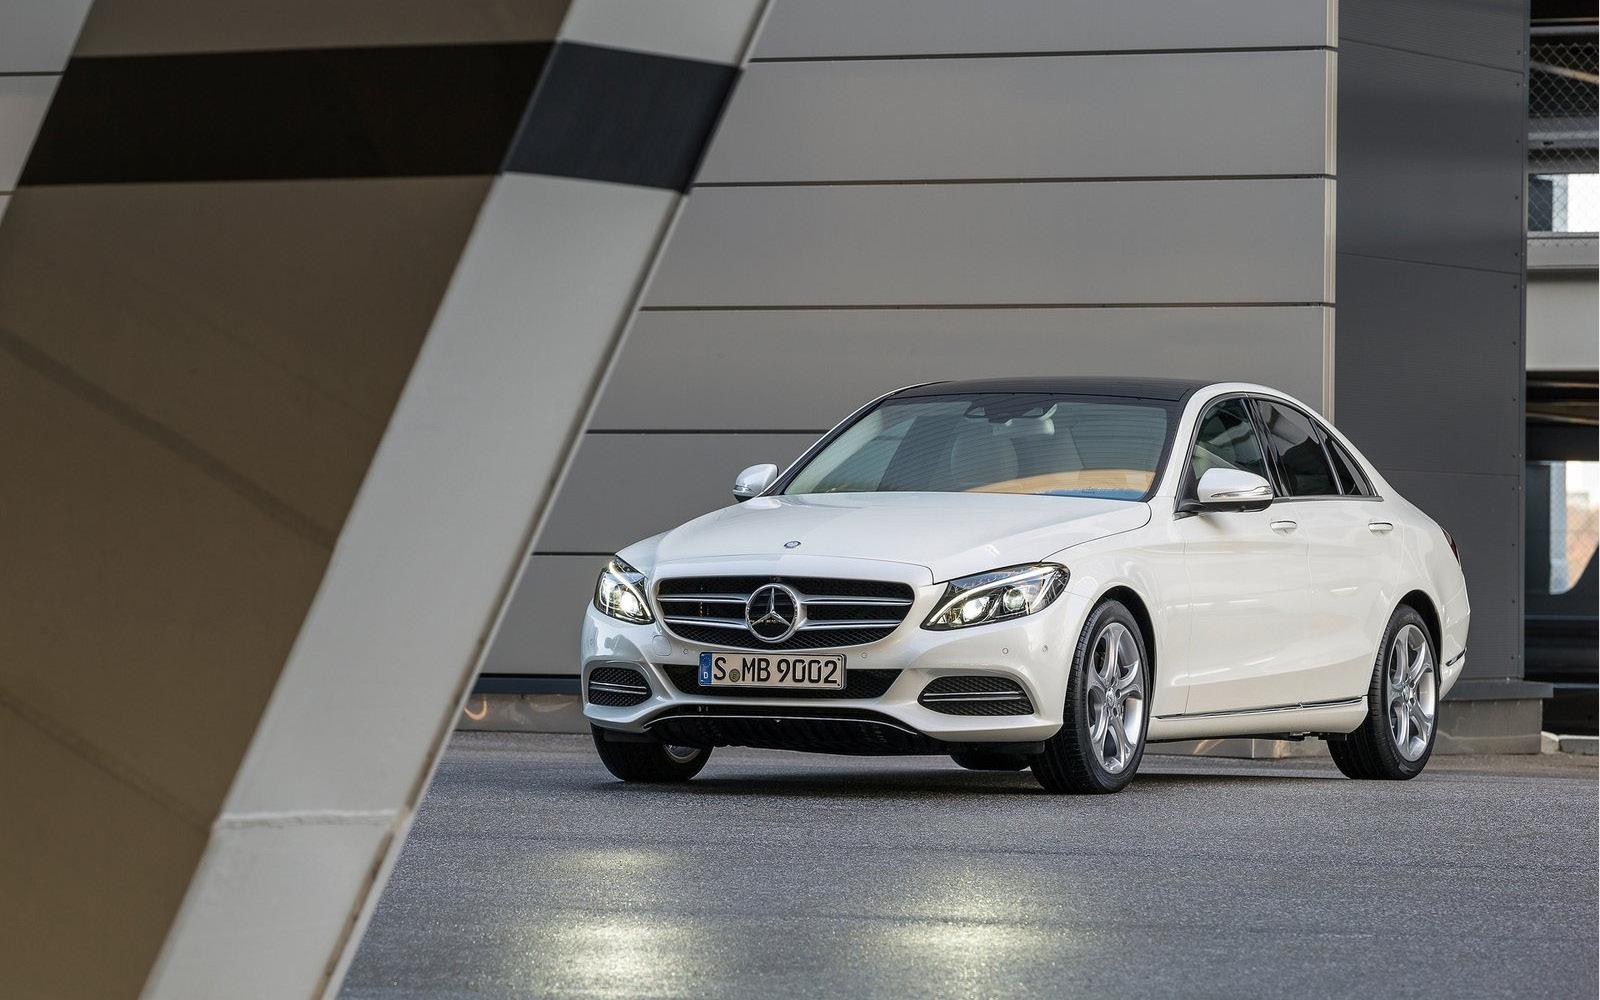 Mercedes benz clase c 2015 4 53 for Mercedes benz delaware